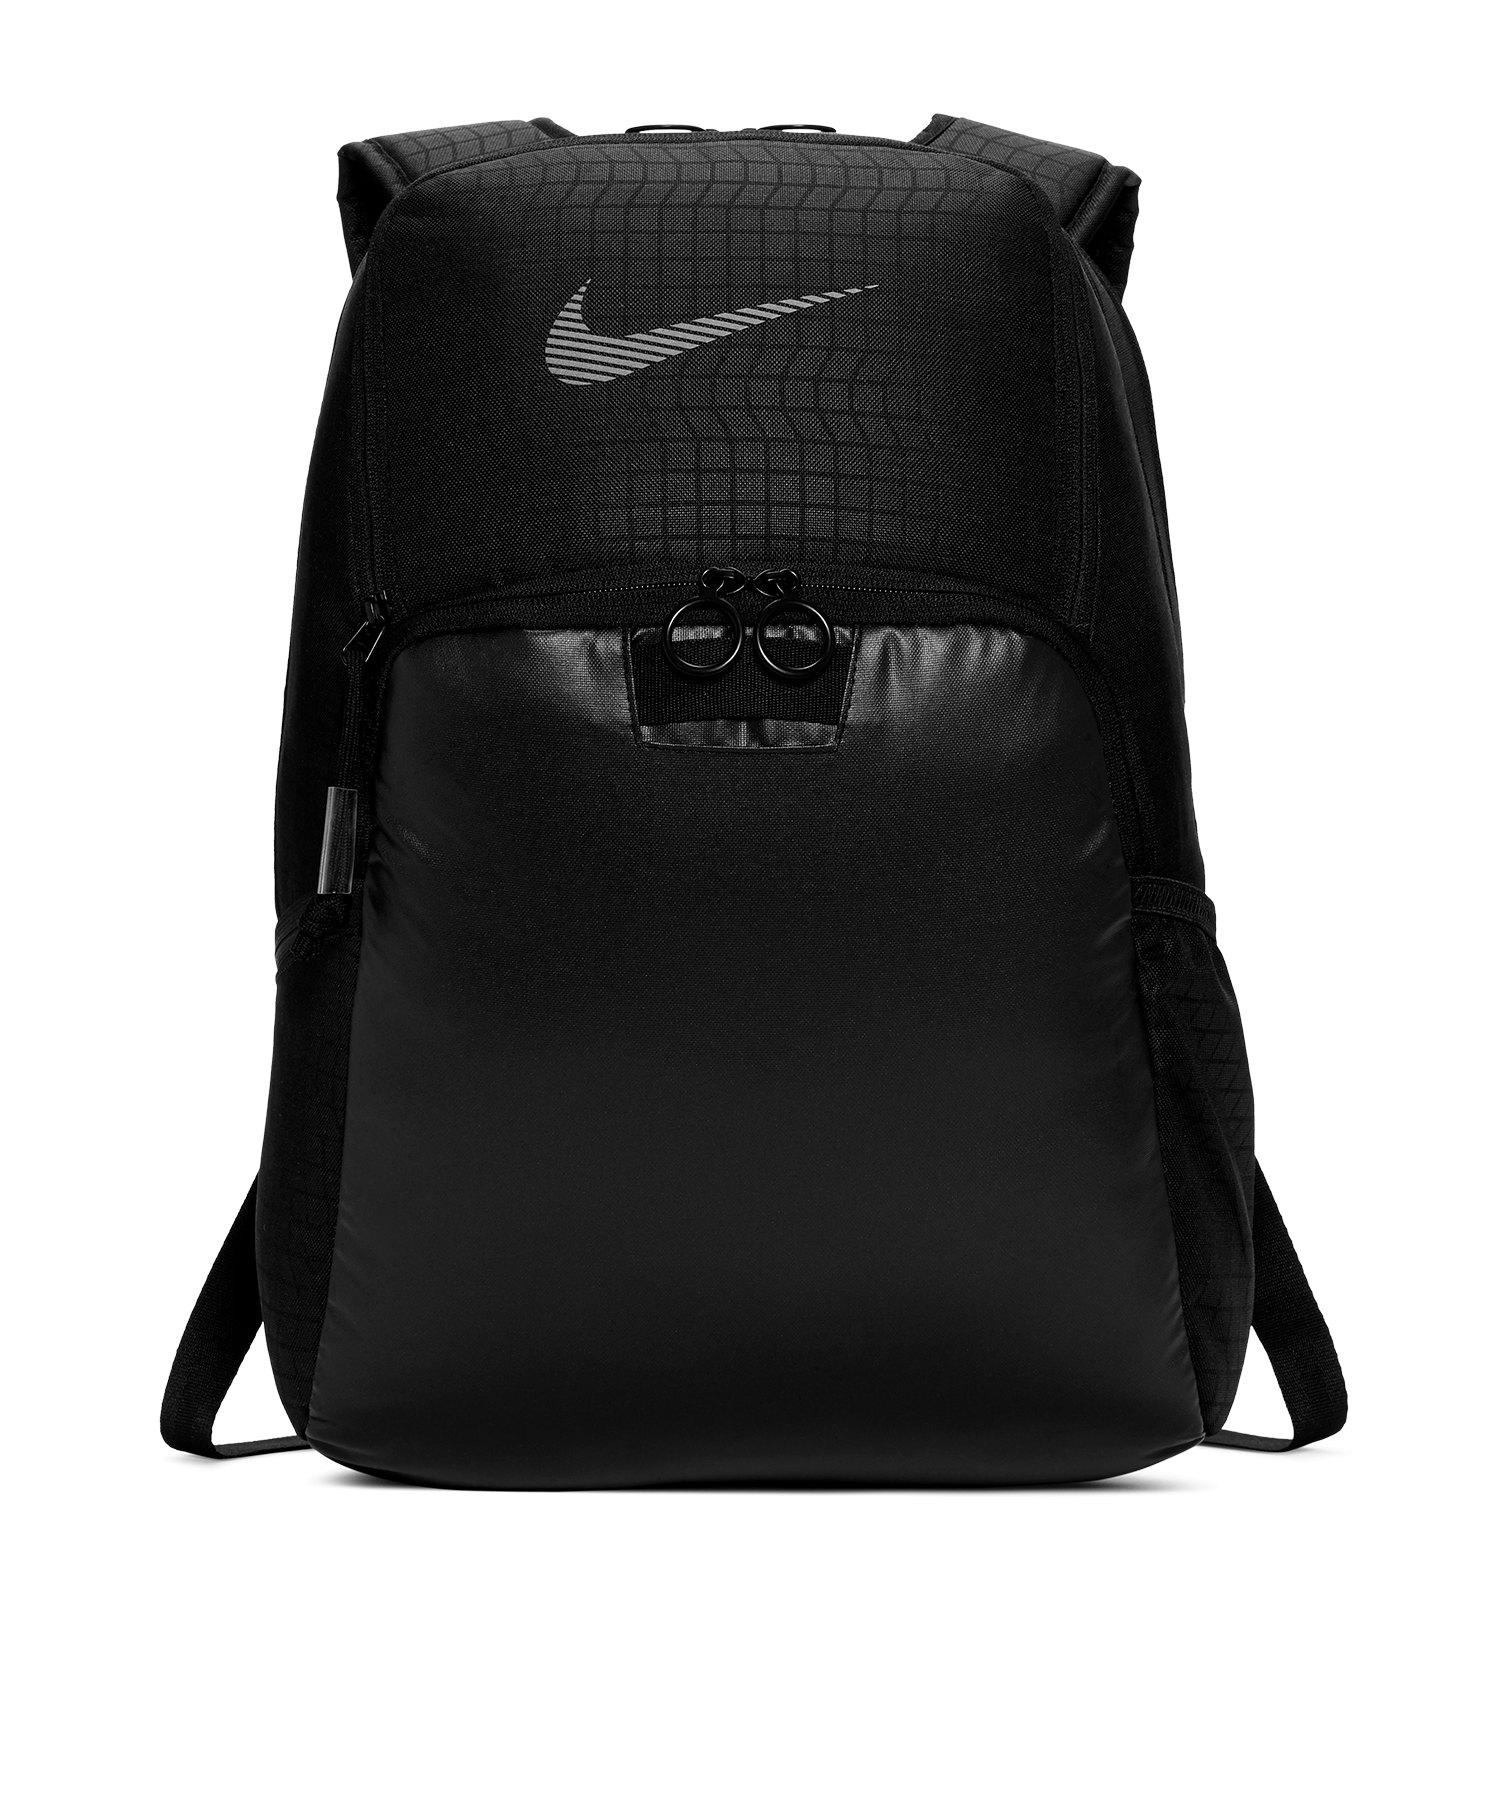 Nike Brasilia Rucksack Schwarz Medium F010 - schwarz